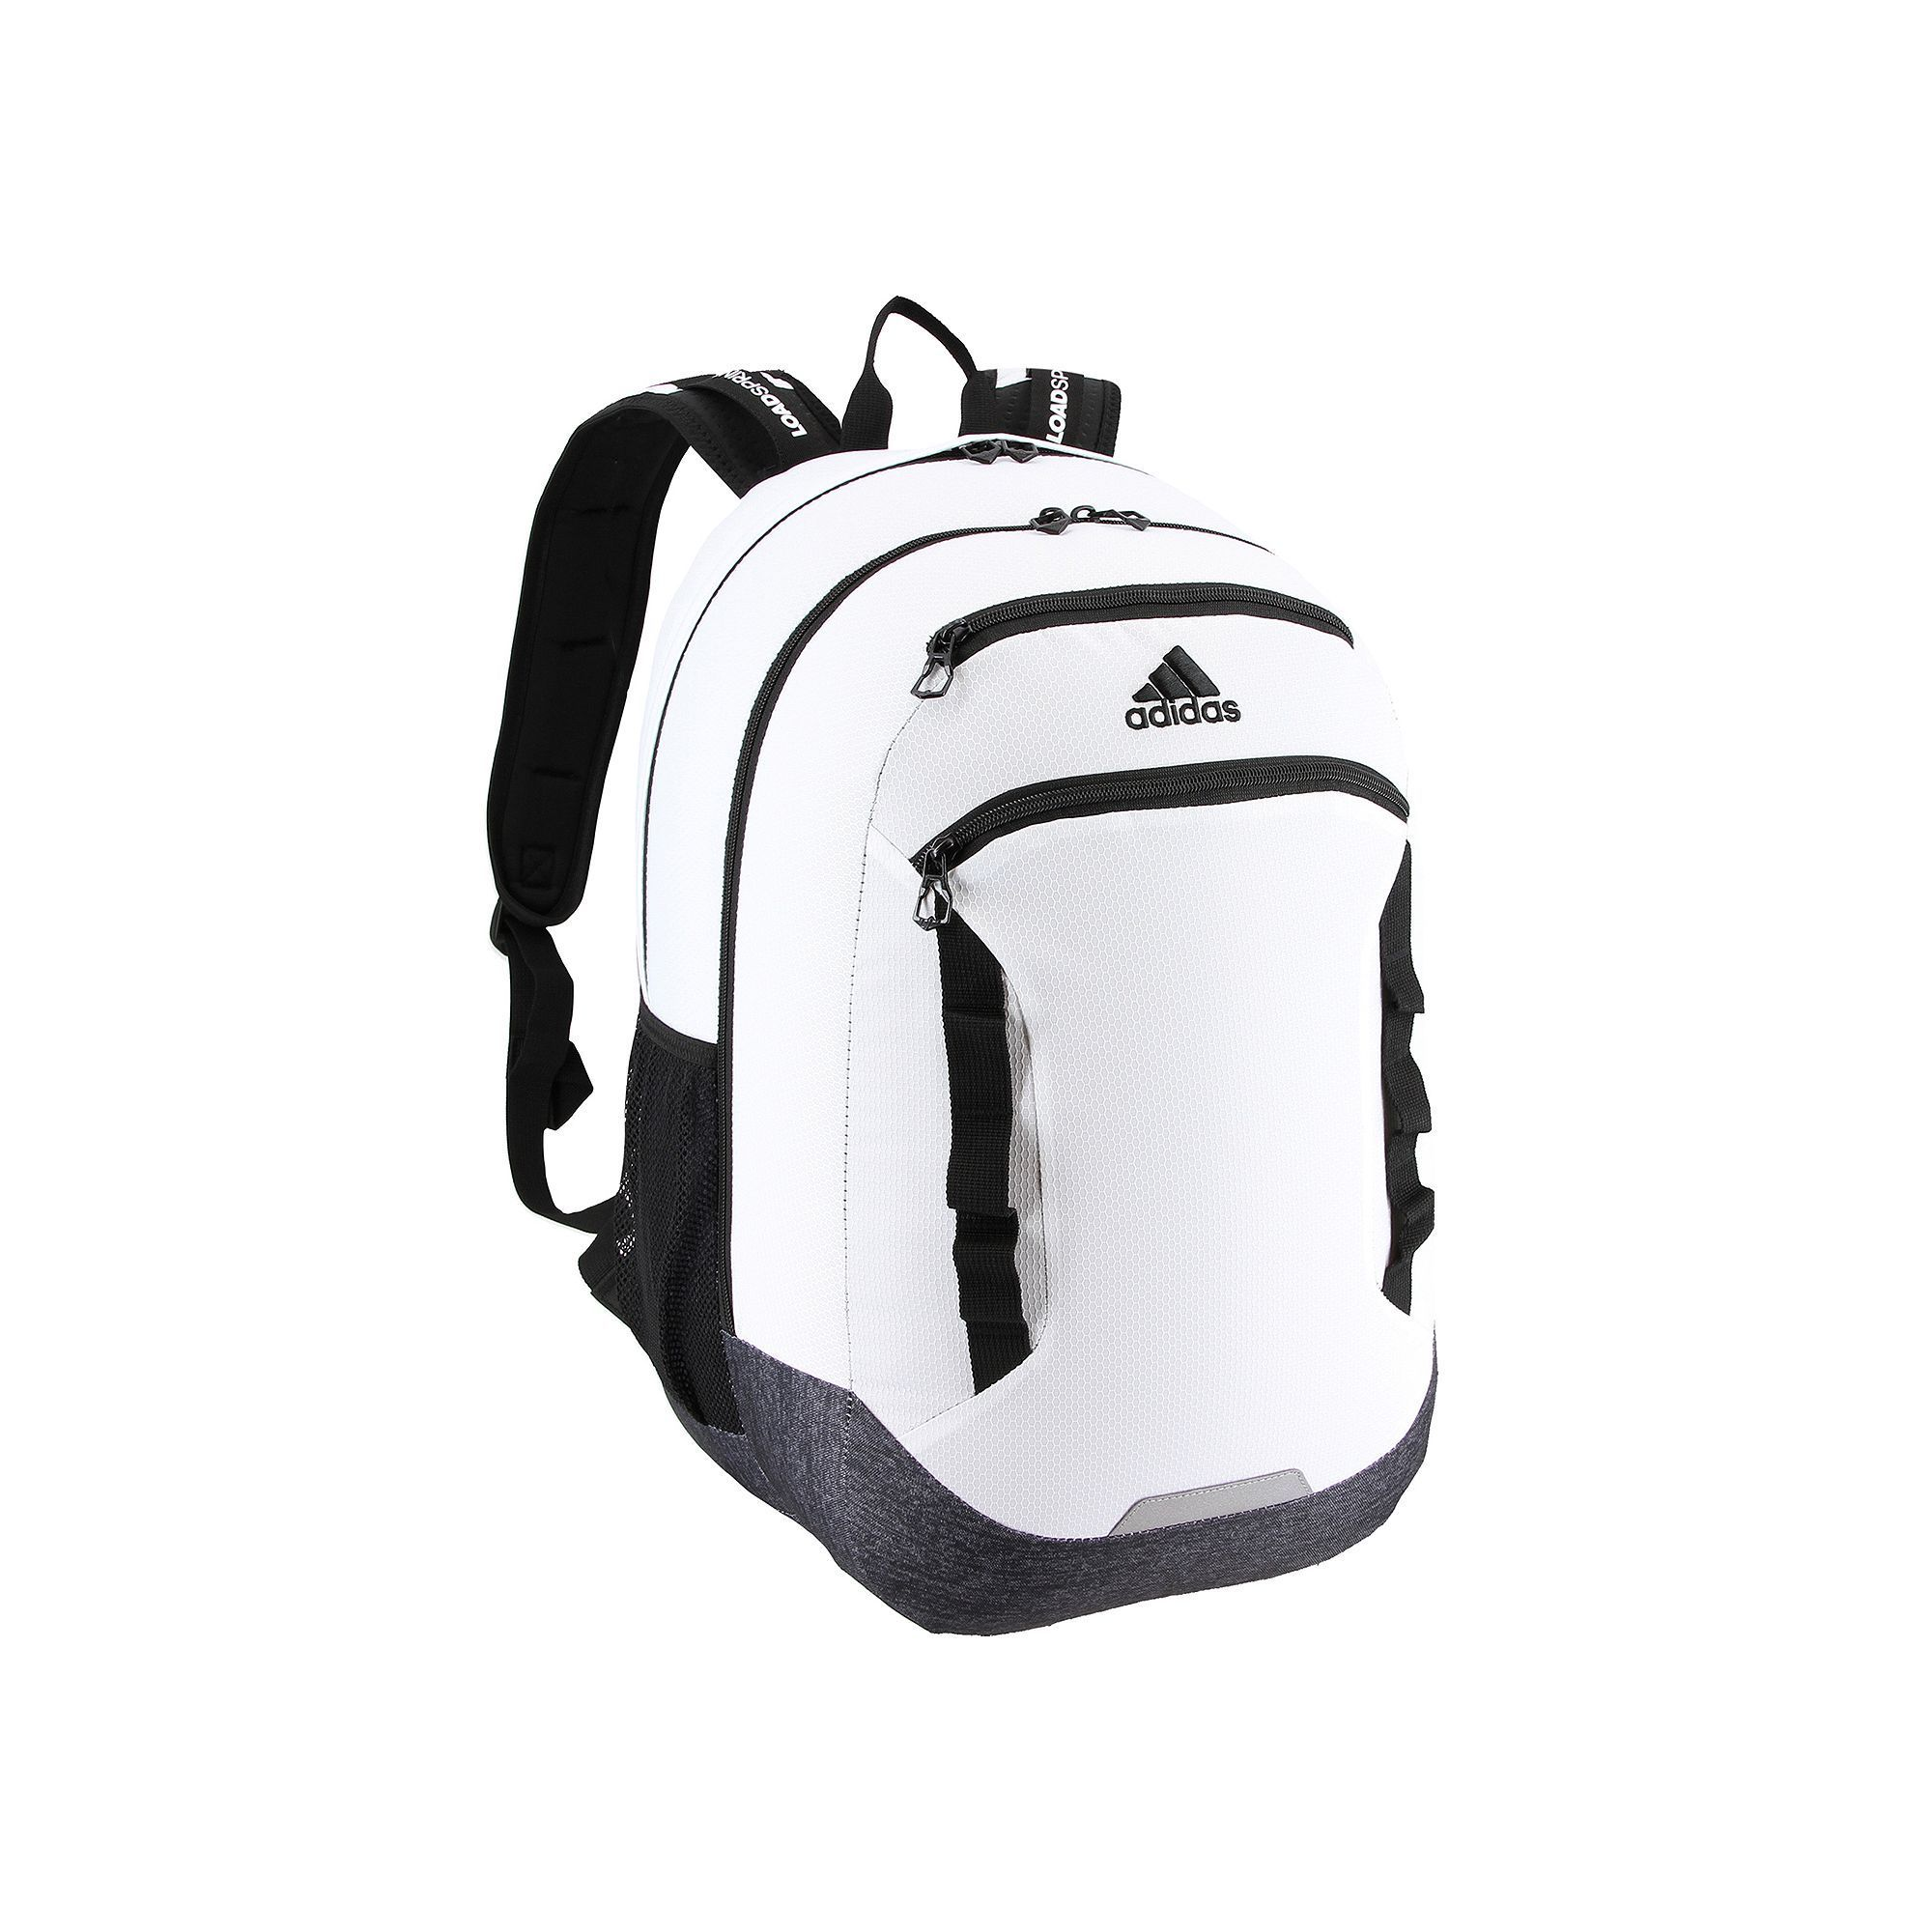 034da611865d adidas Excel III Laptop Backpack